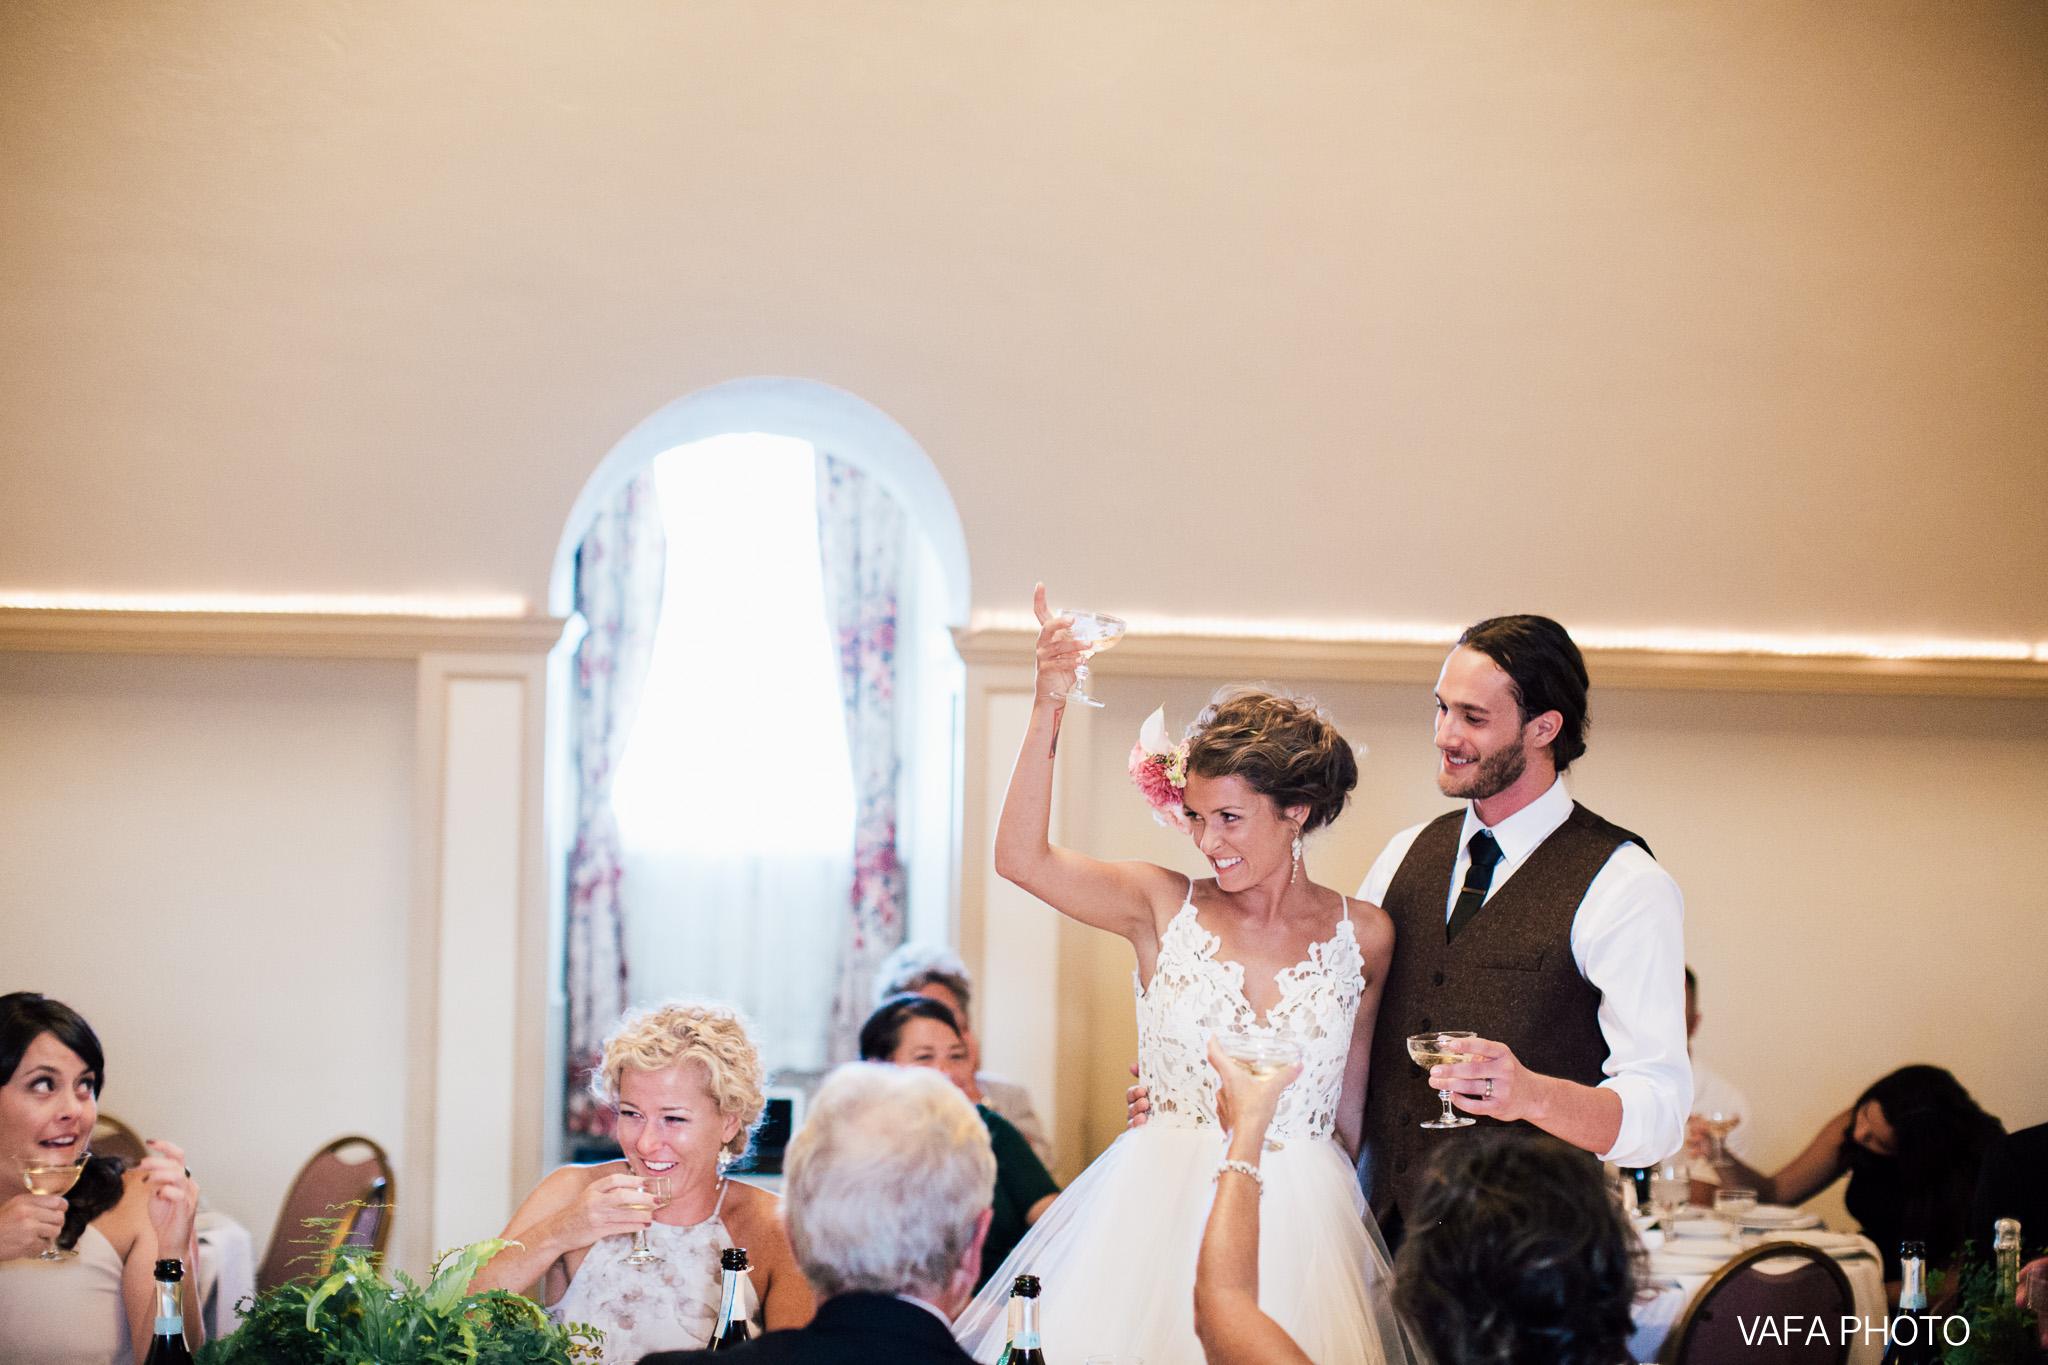 The-Felt-Estate-Wedding-Kailie-David-Vafa-Photo-990.jpg